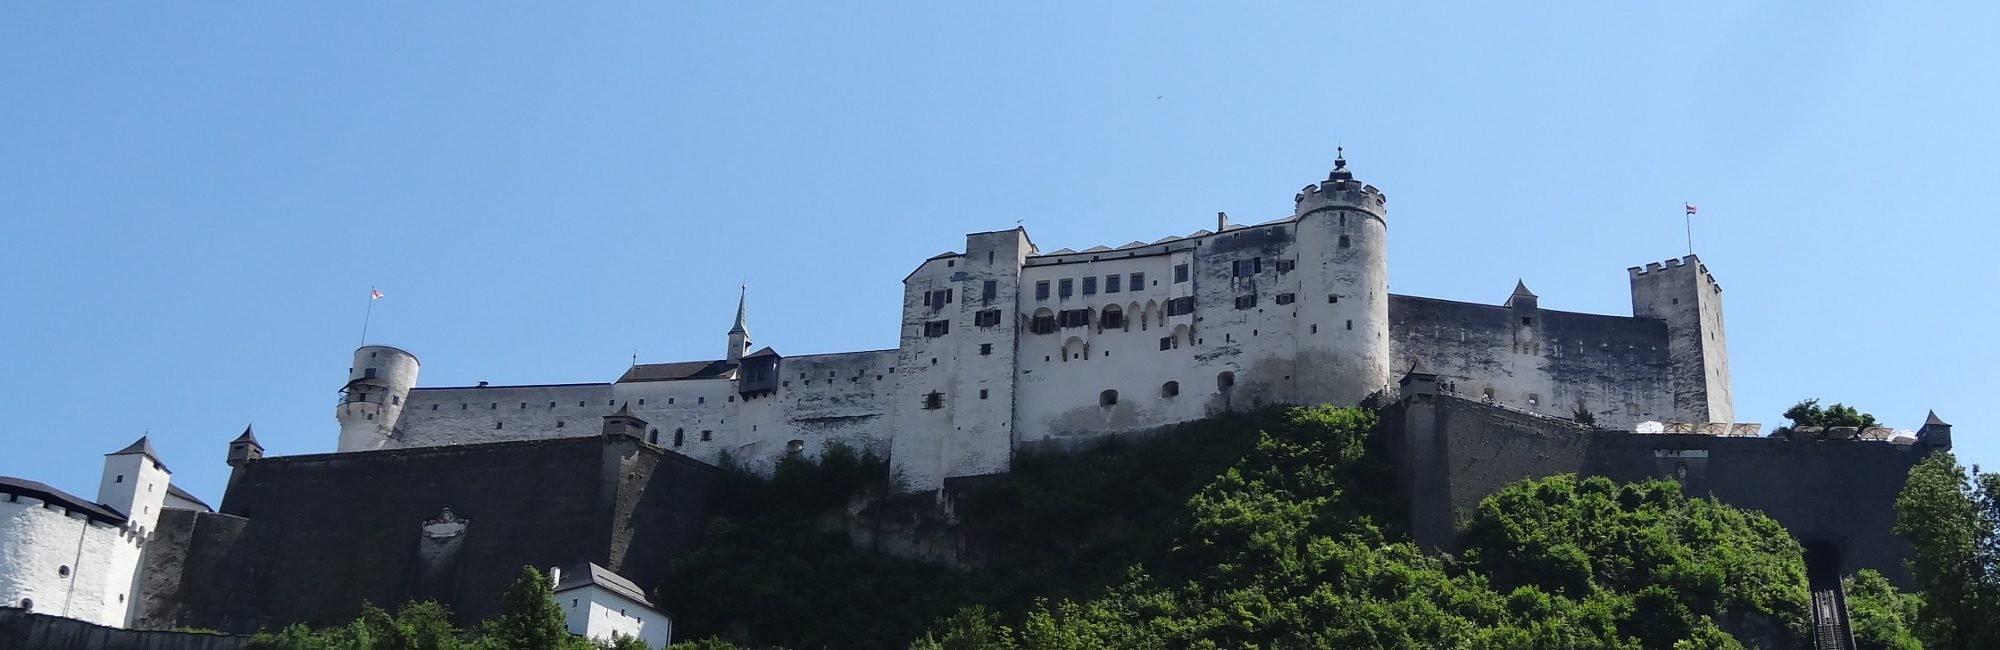 Fortress Hohensalzburg Banner